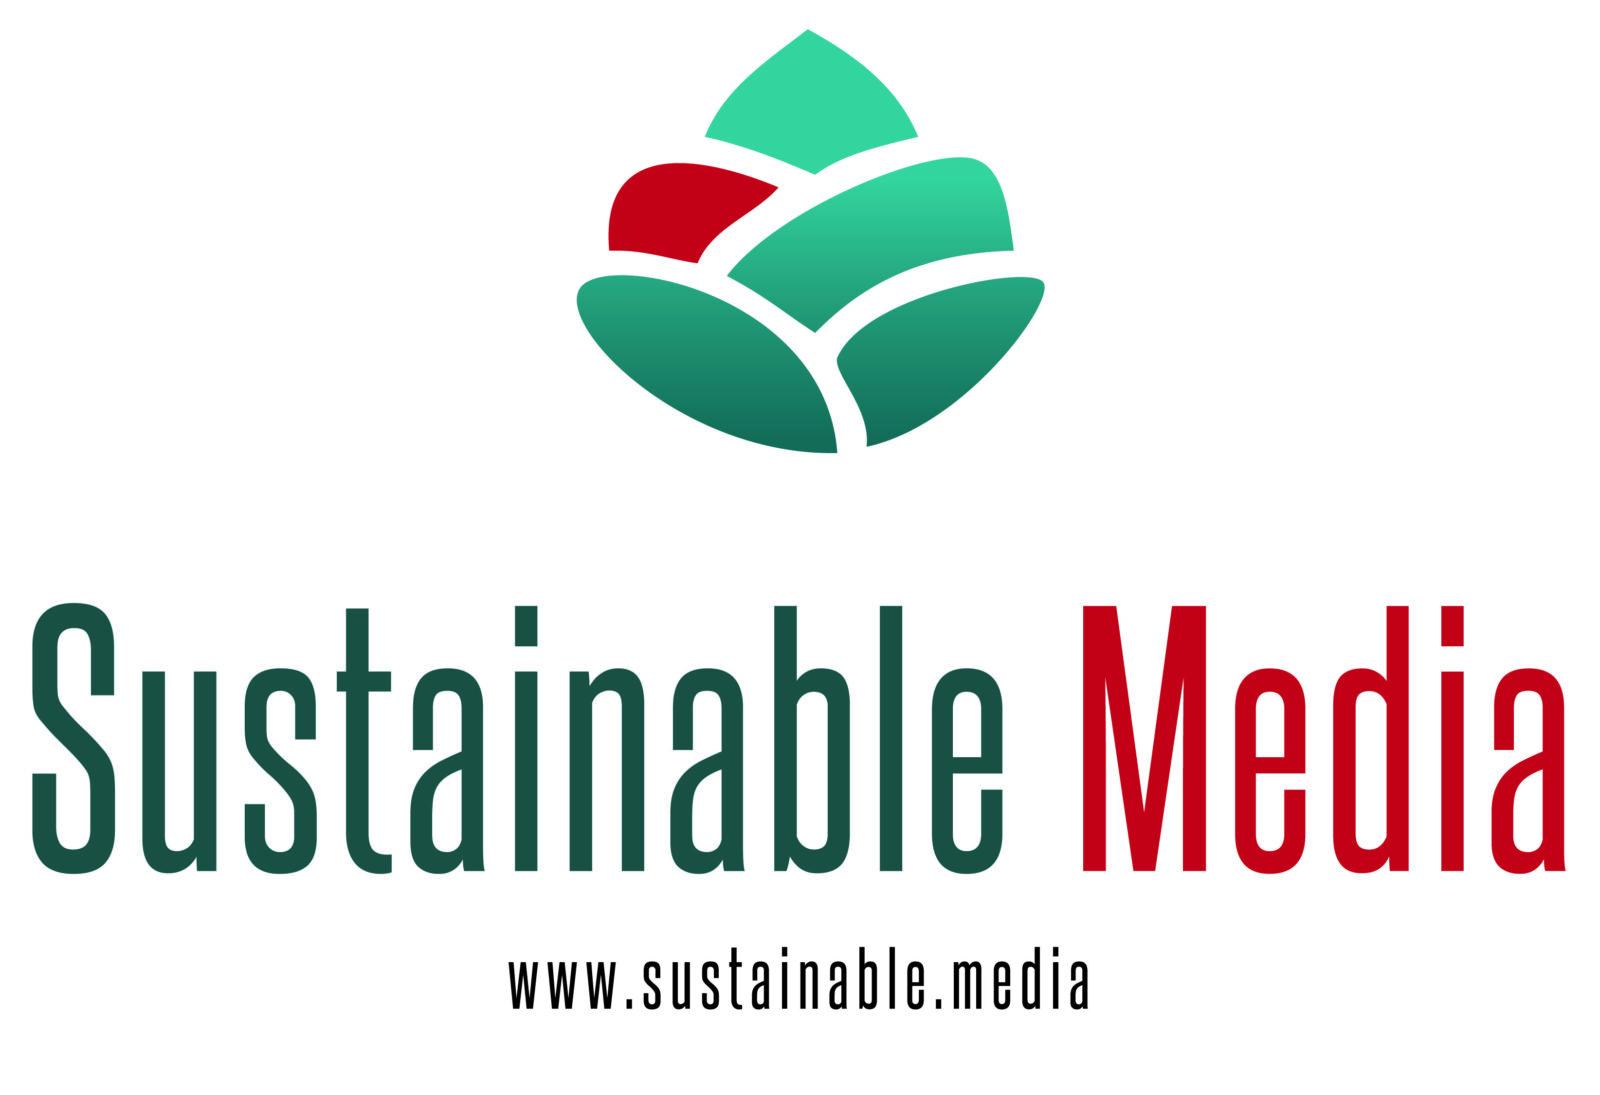 WFPB.ORG Alliance | Sustainable Media